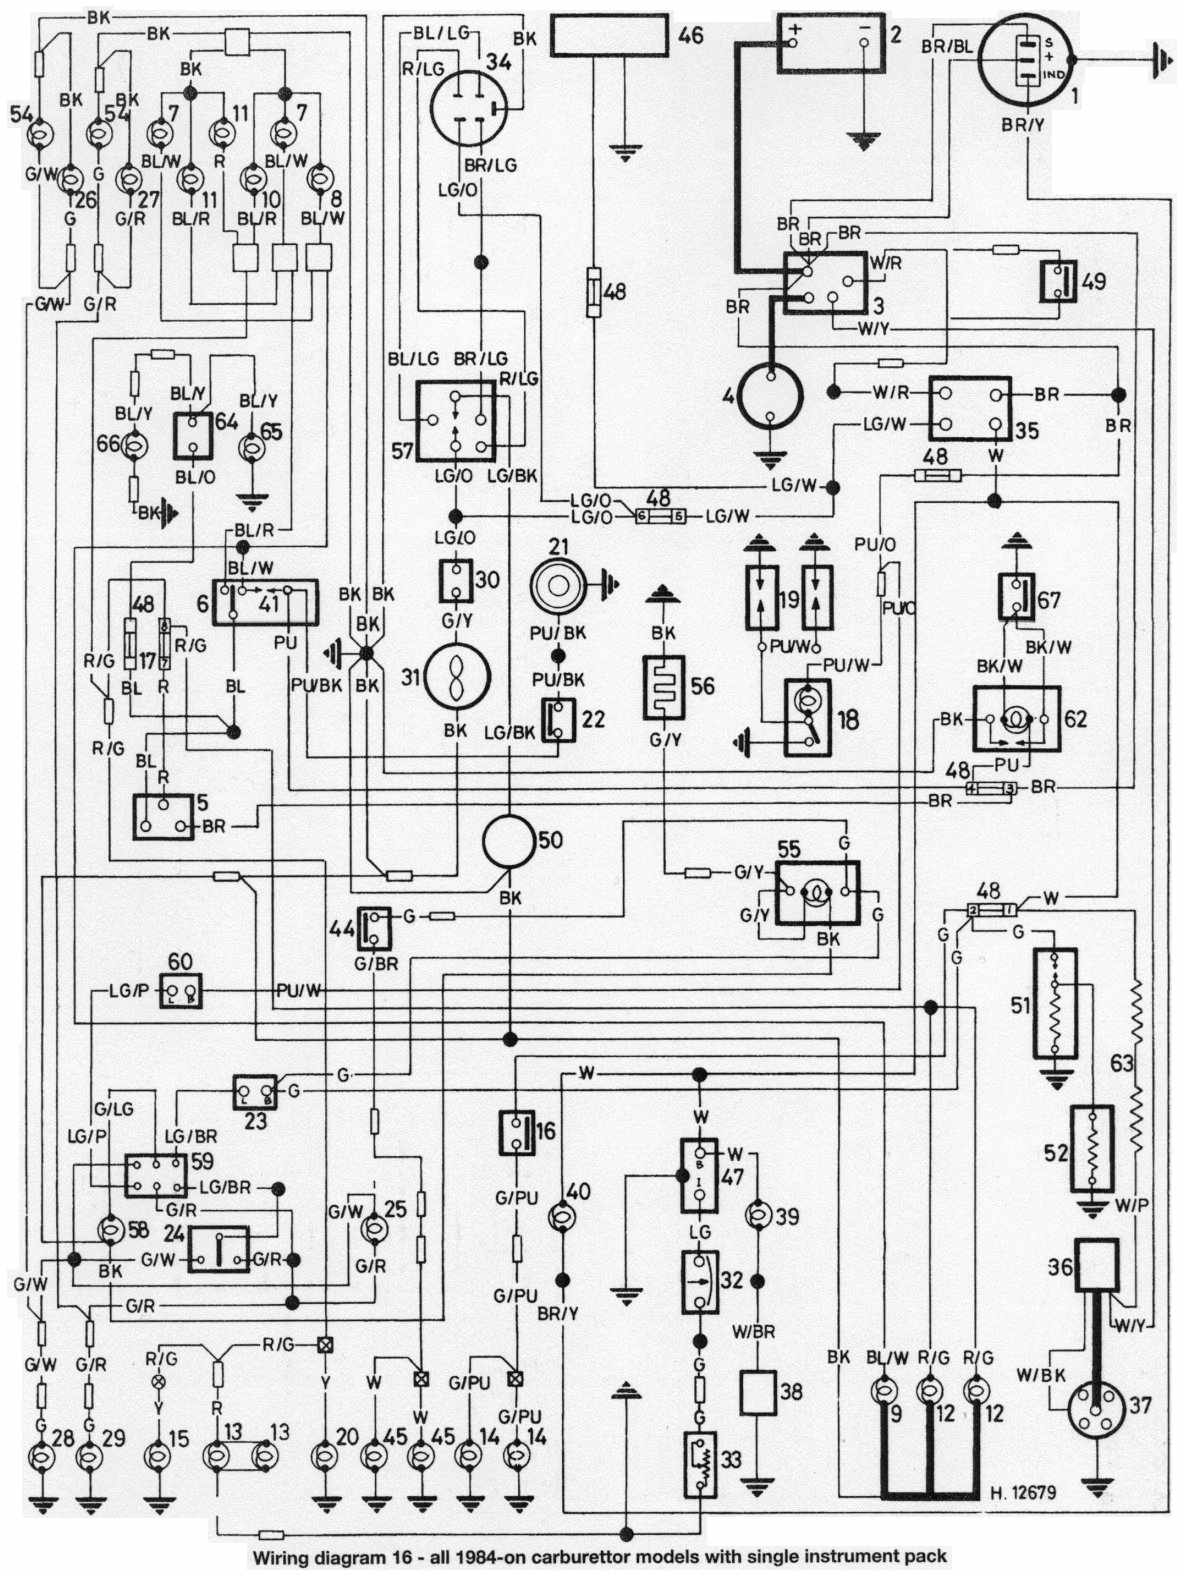 mini car manuals wiring diagrams pdf fault codes